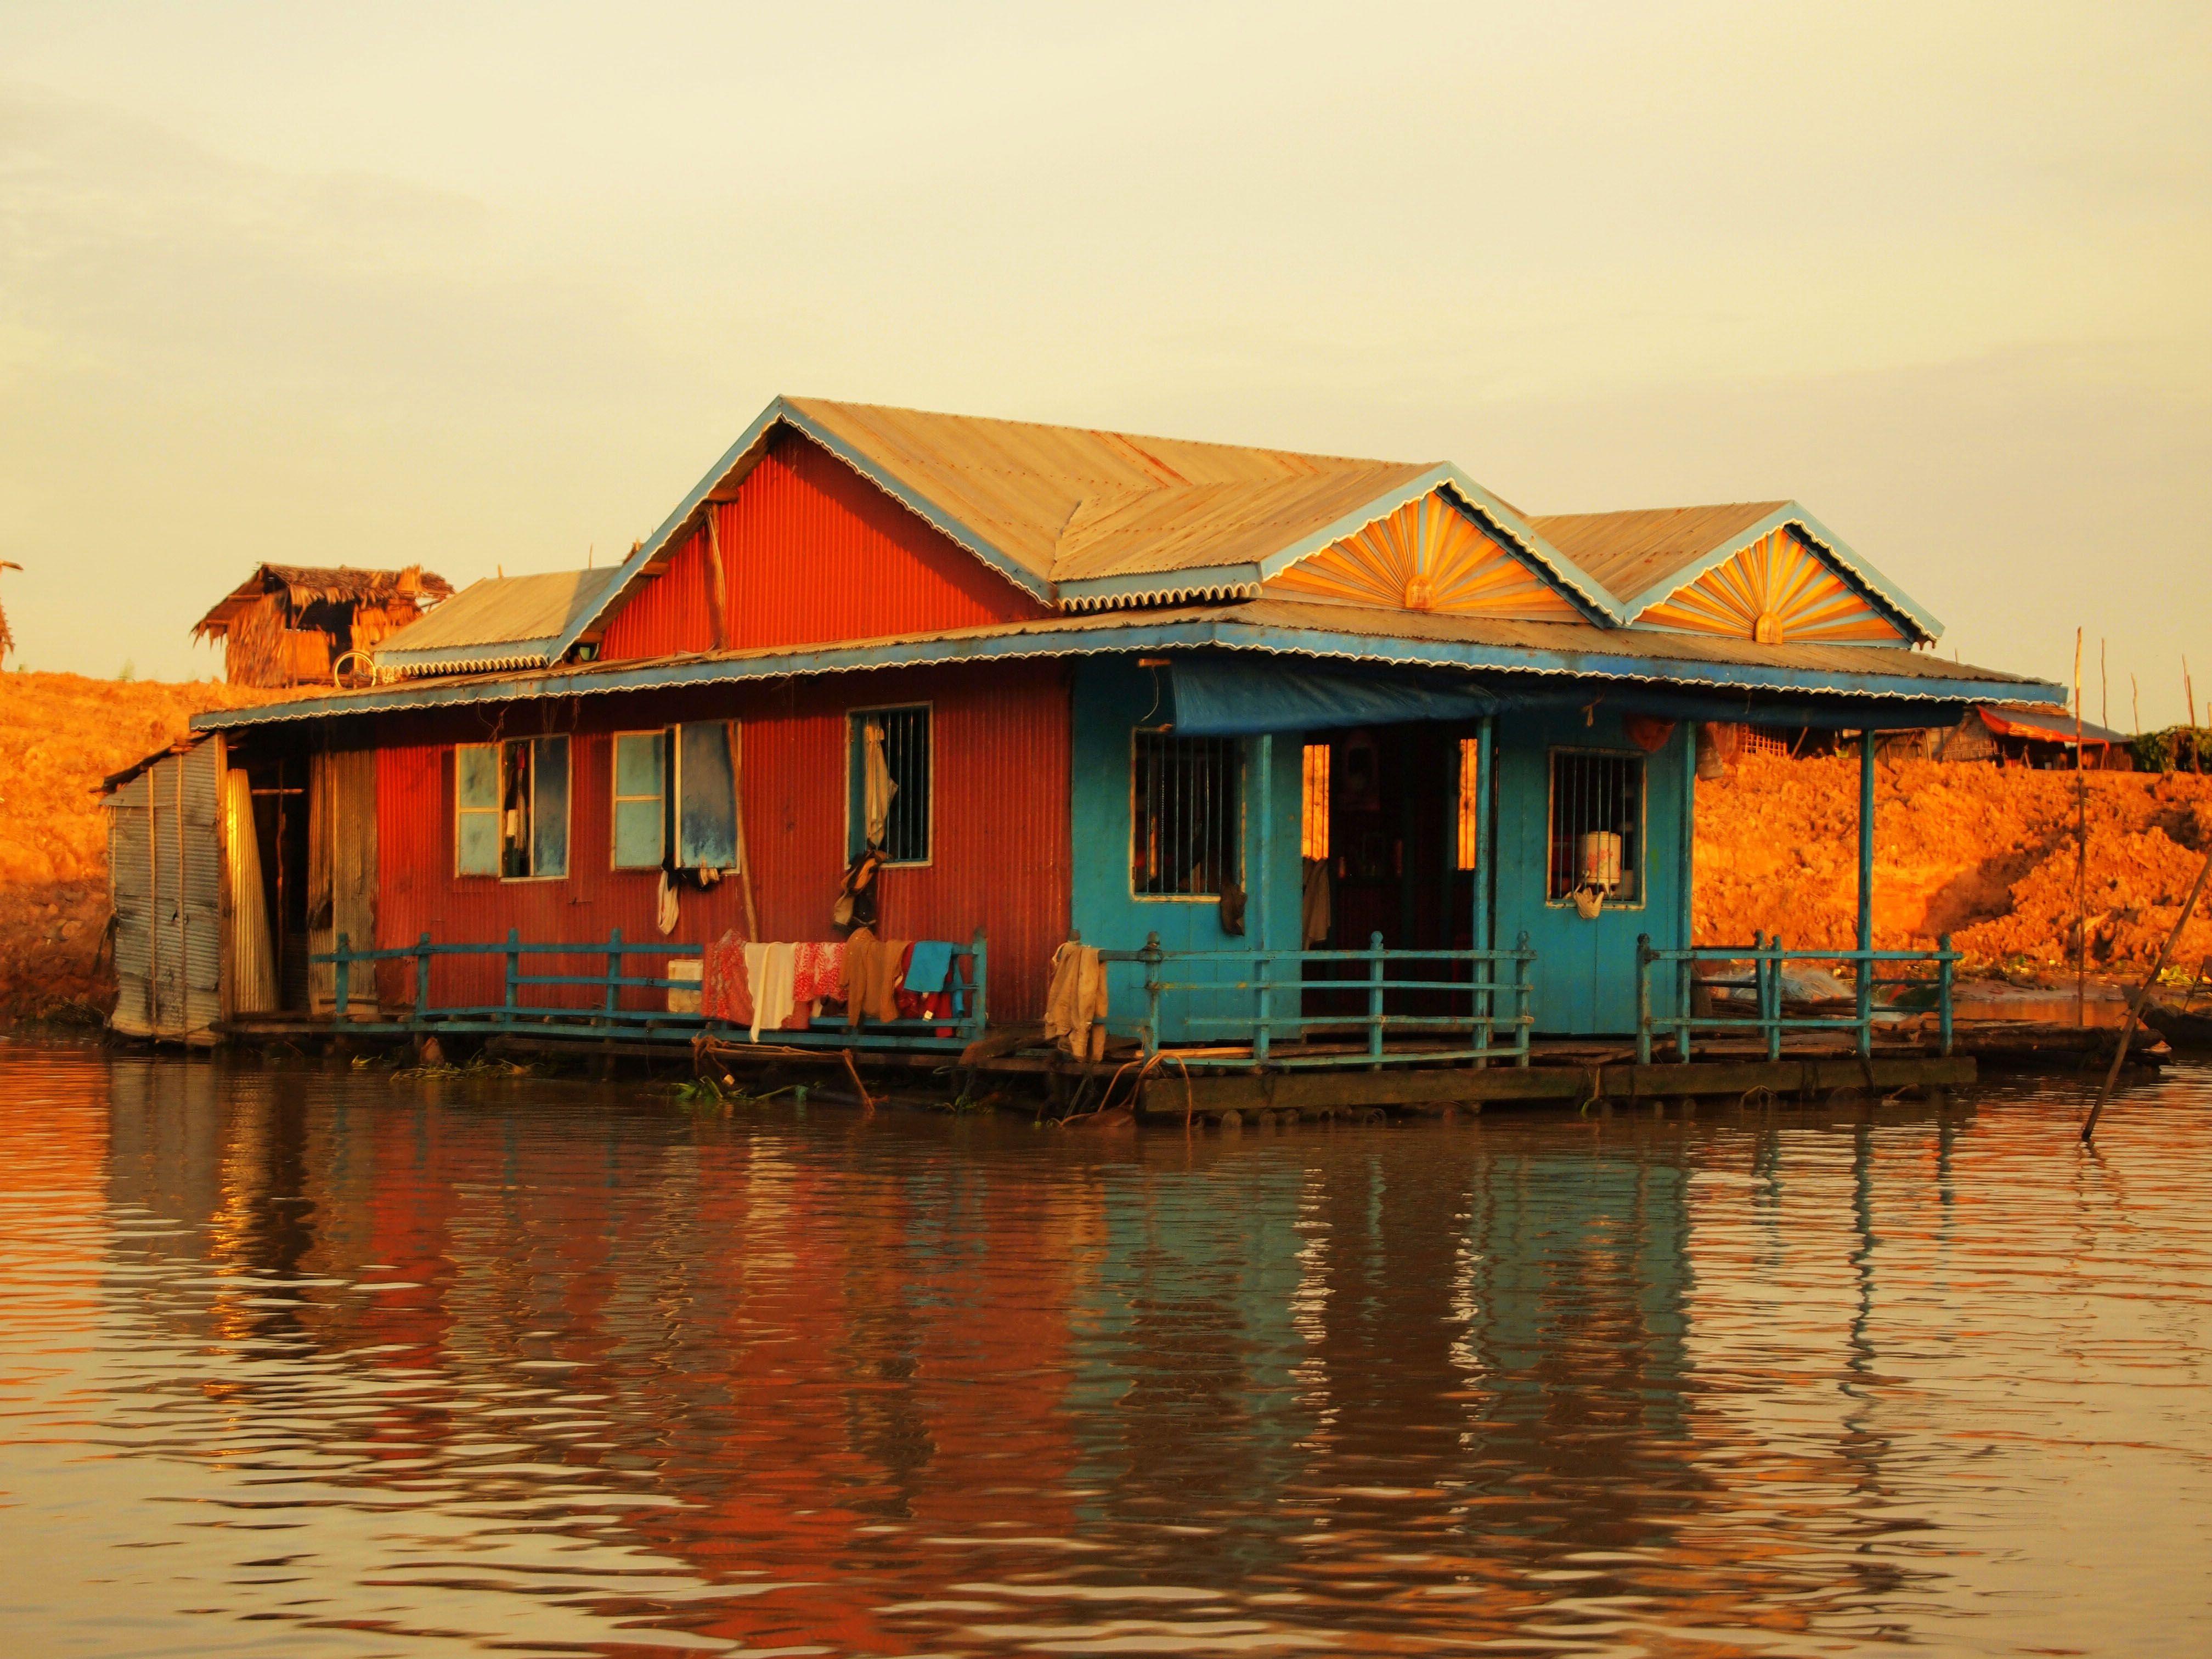 The Tonlé Sap Lake - Cambodia